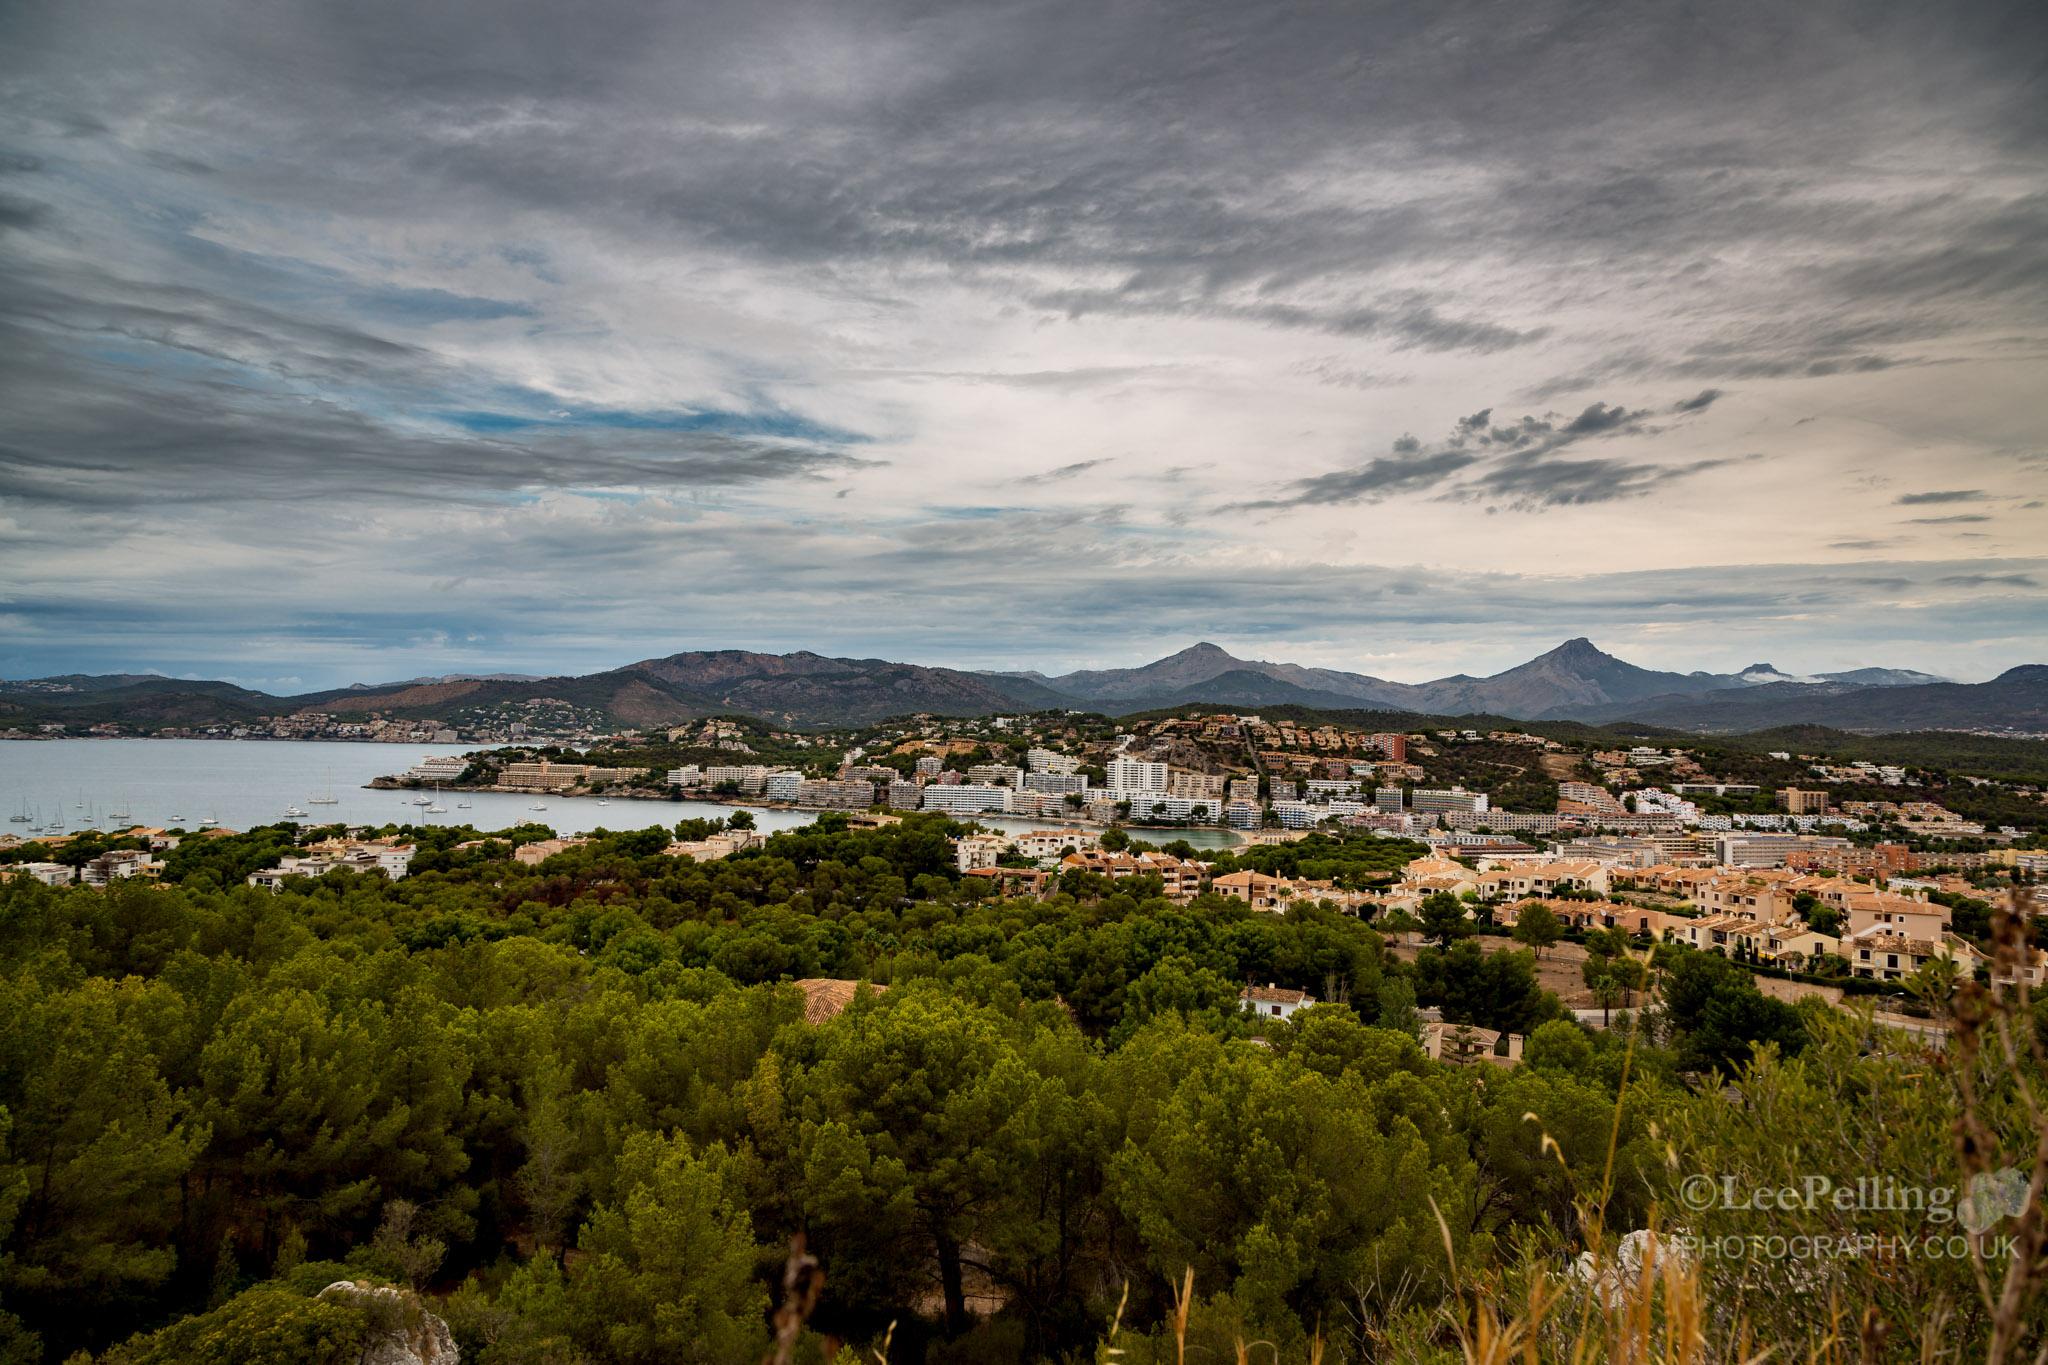 Overlooking Santa Ponsa